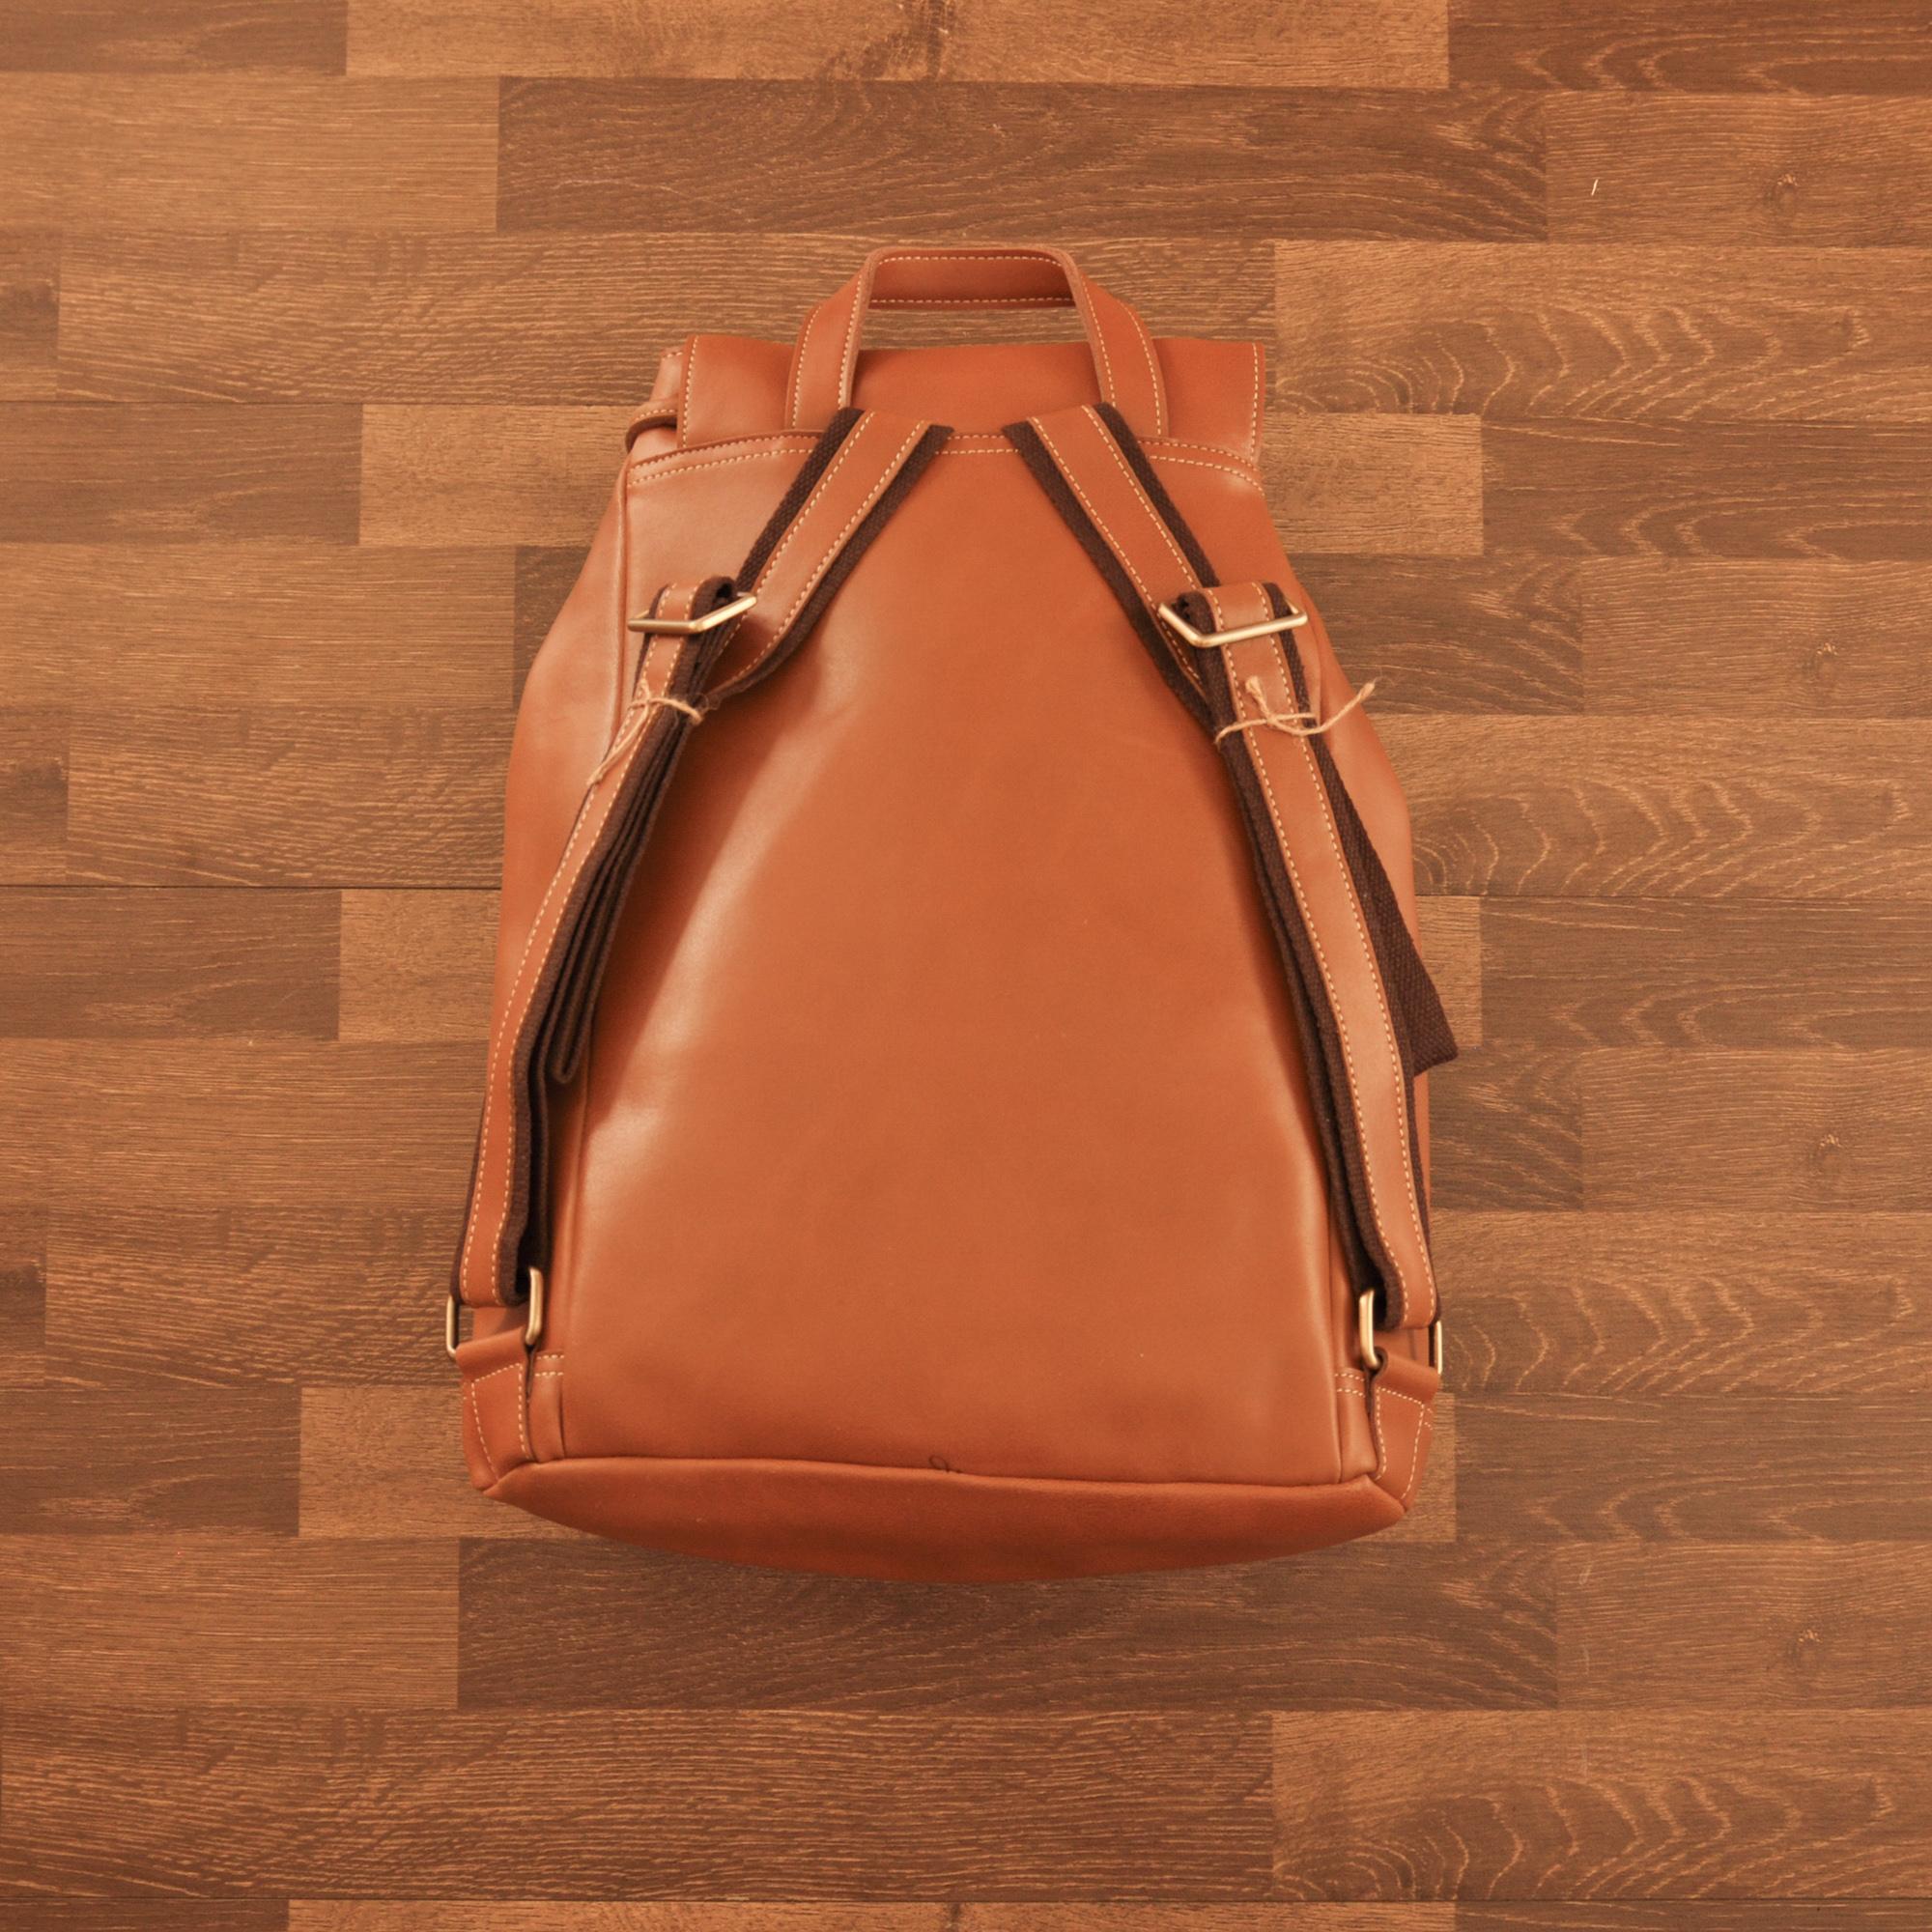 Model 1 - Tan - Back